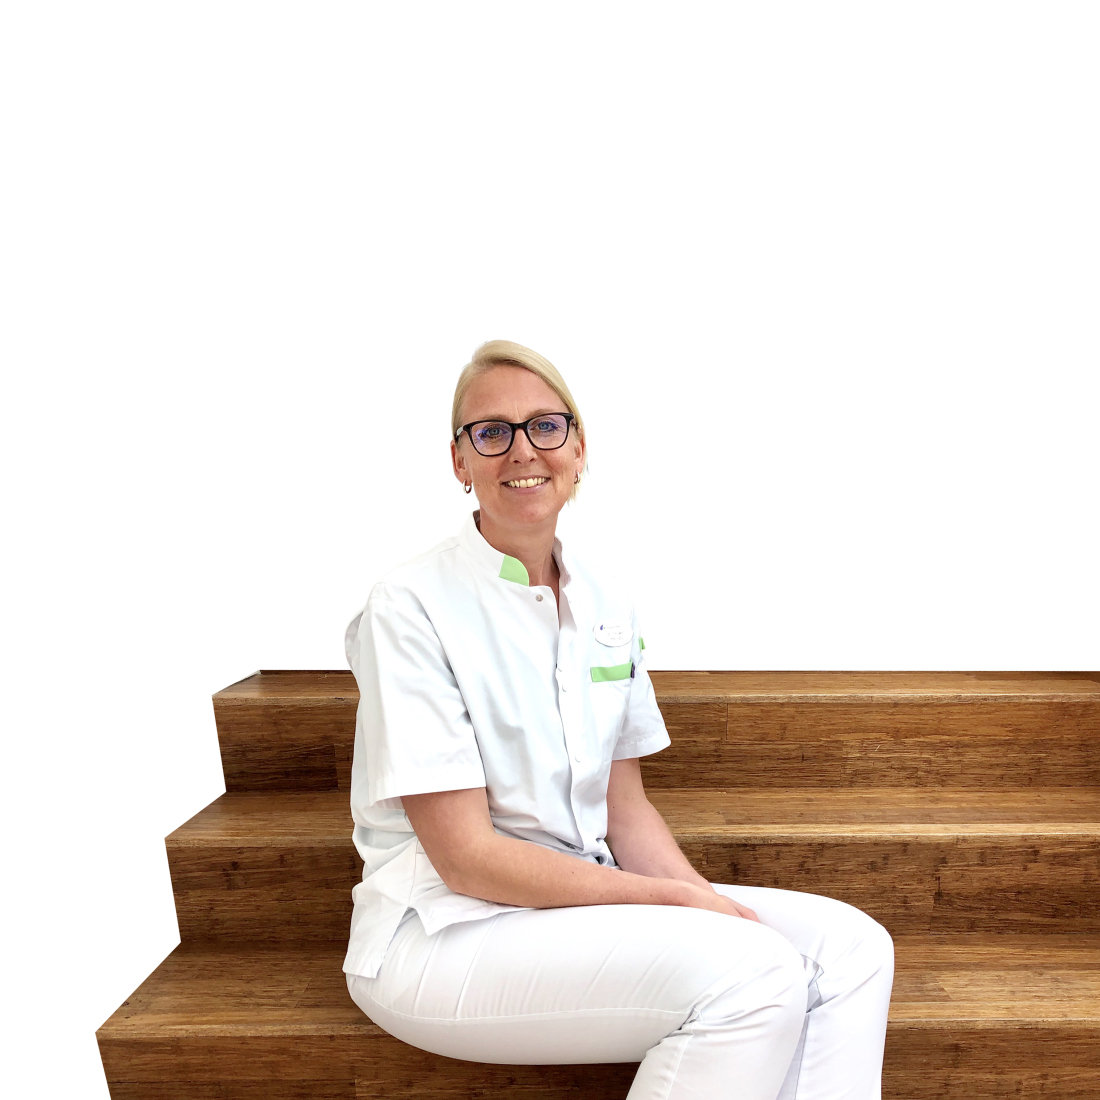 KNO-arts Jolijn Brouwer over neussprayverslaving